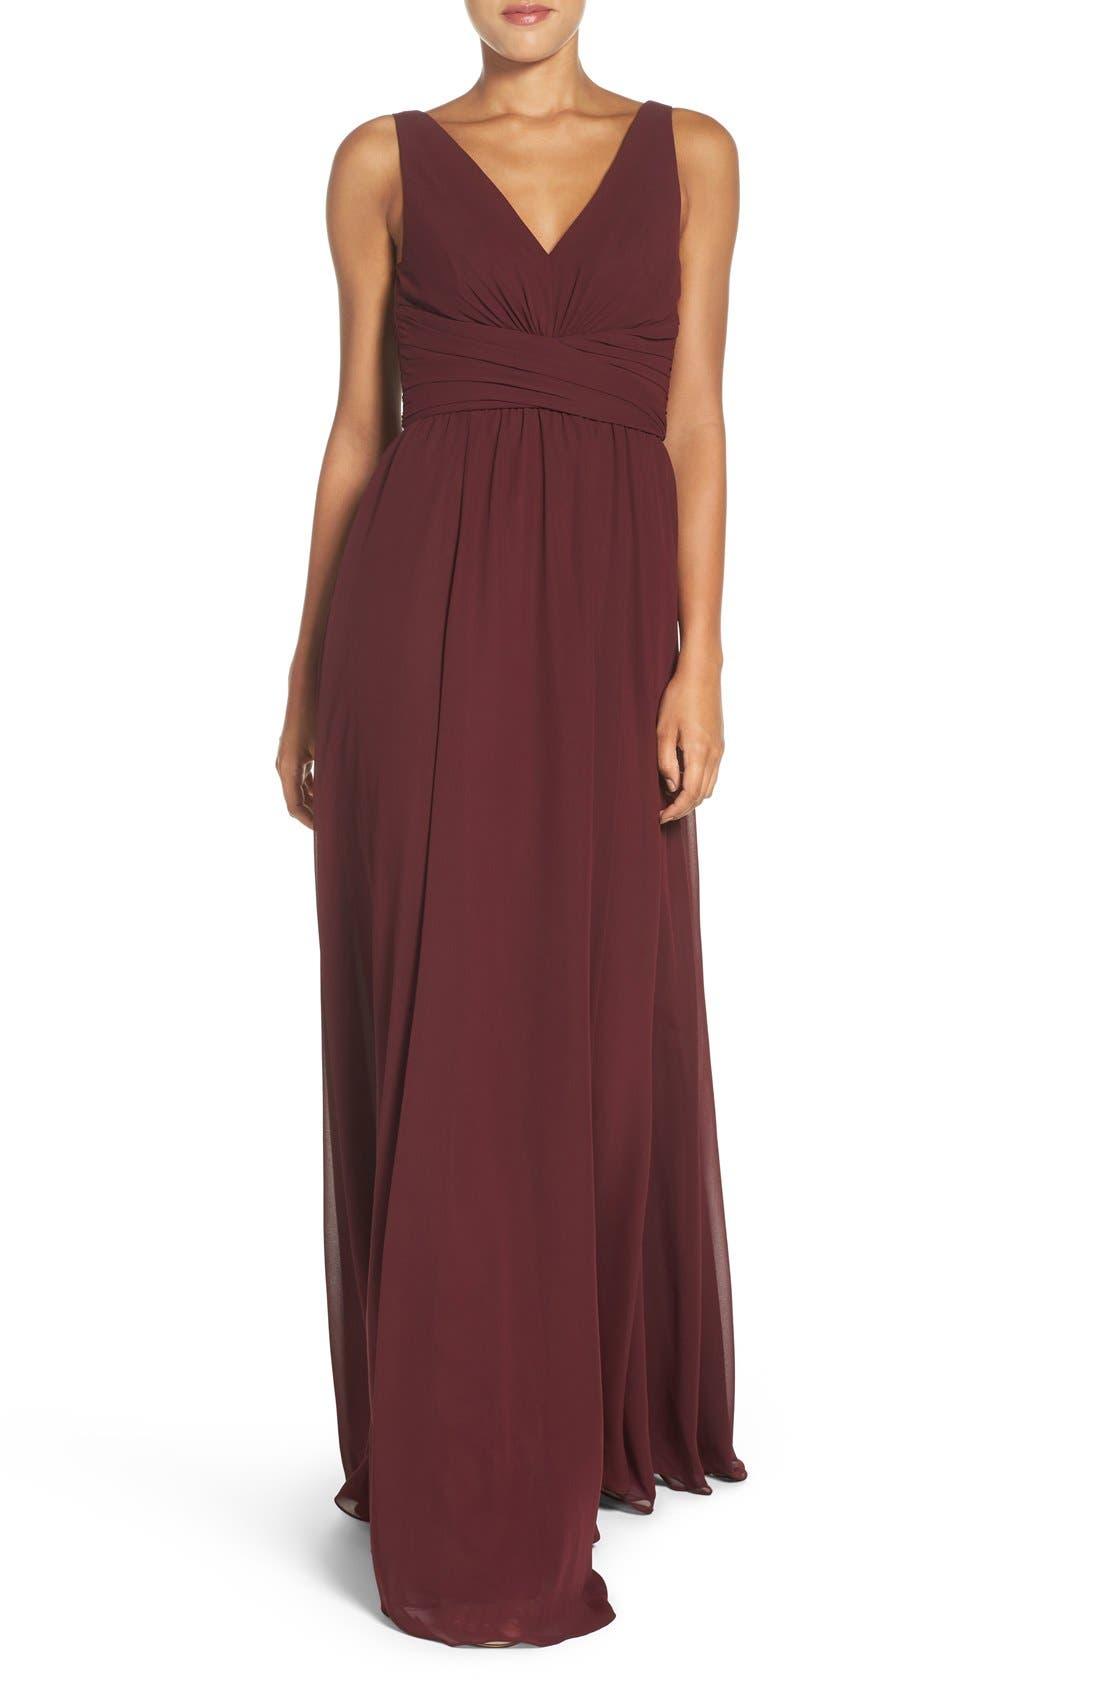 Amsale 'Justine' Double V-Neck Chiffon Gown